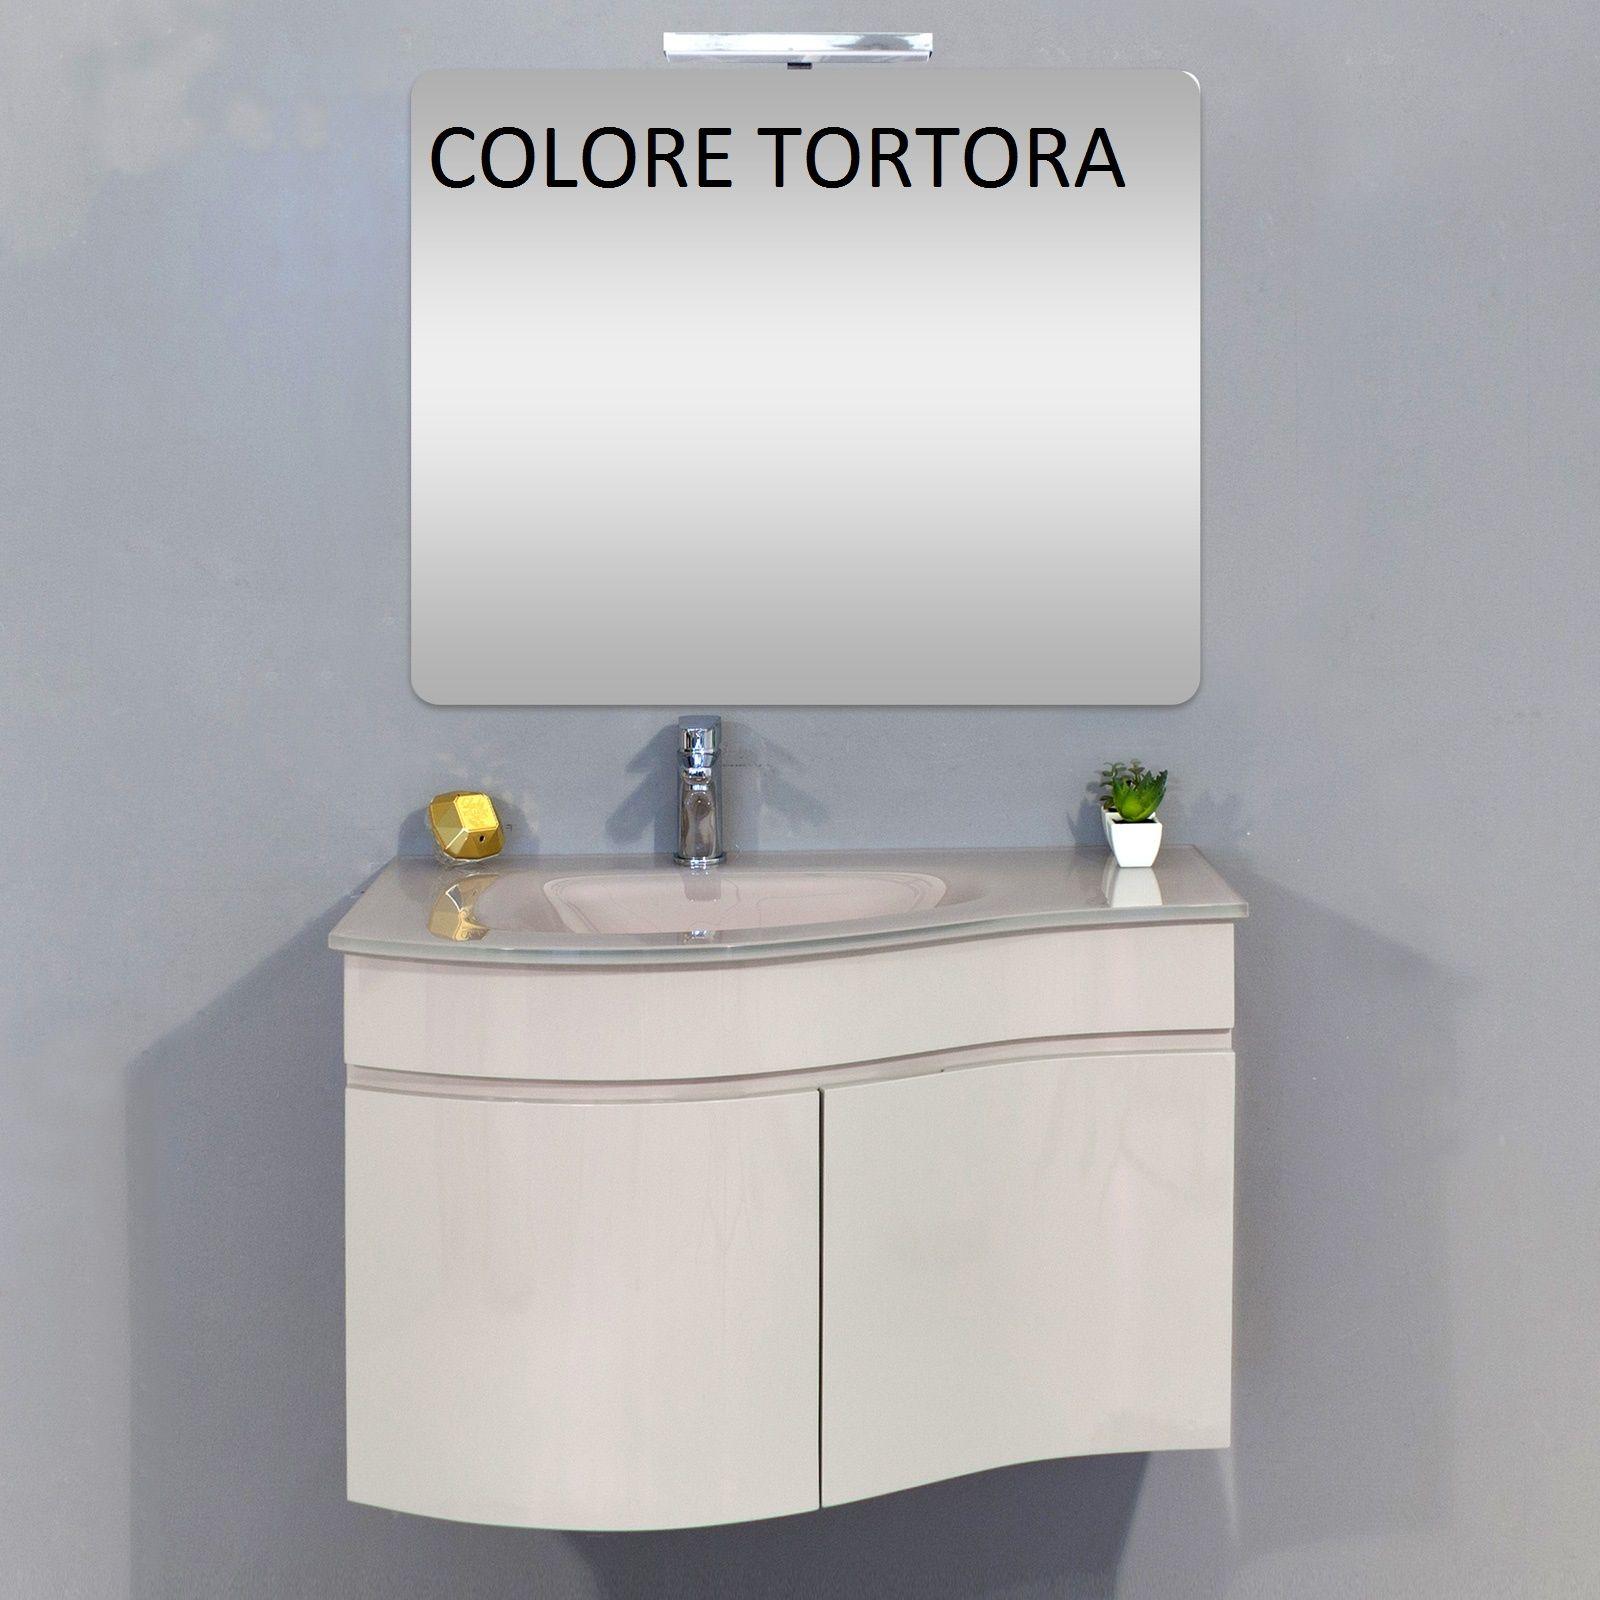 Lavabo Rojo Cristal.Mueble De Bano Asia Completo Con Lavabo De Cristal De